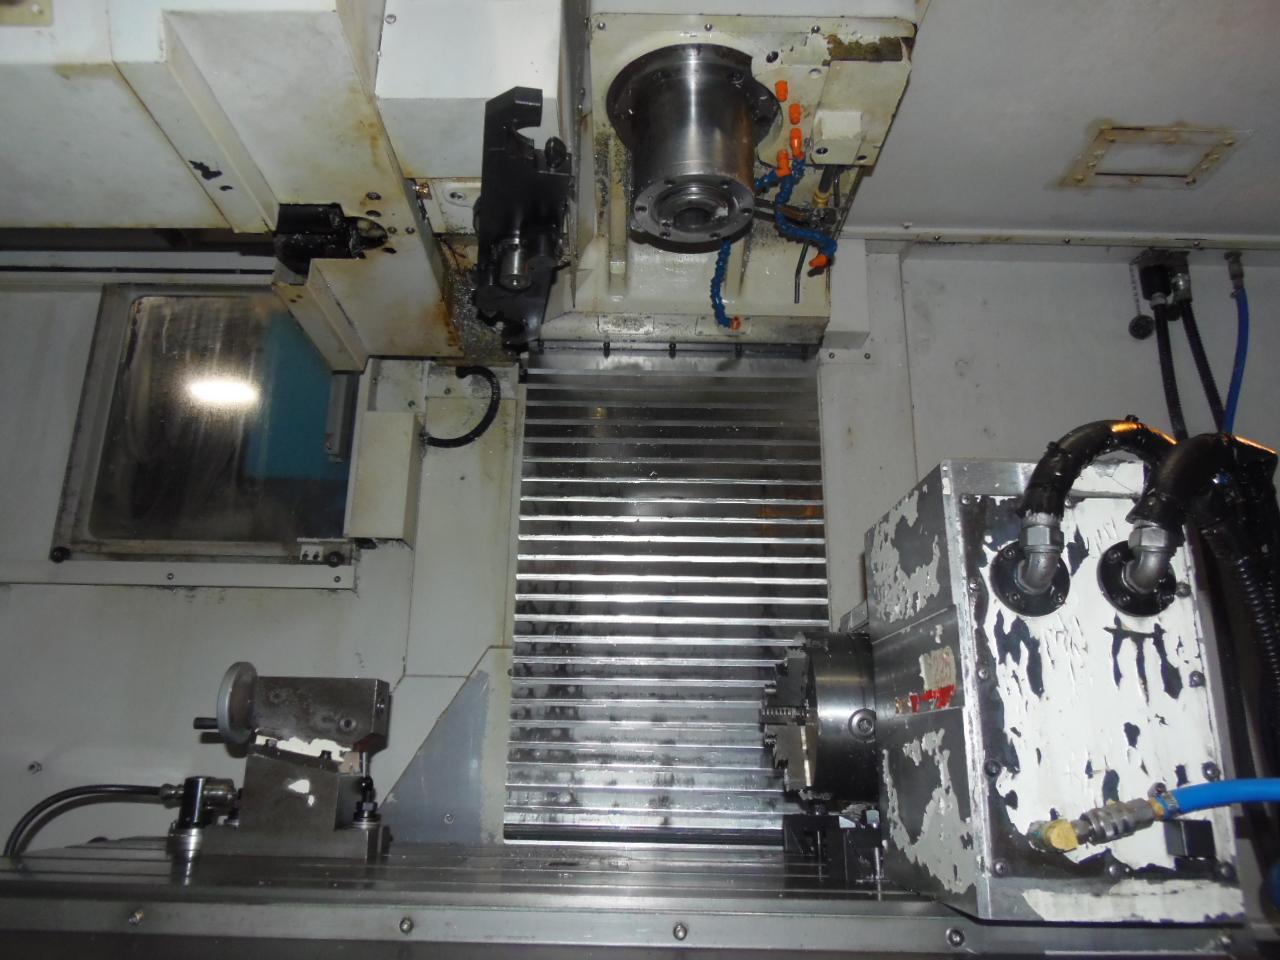 DAEWOO DOOSAN DVM-4020L VERTICAL MACHINING CENTER, 4TH AXIS TABLE, 2006